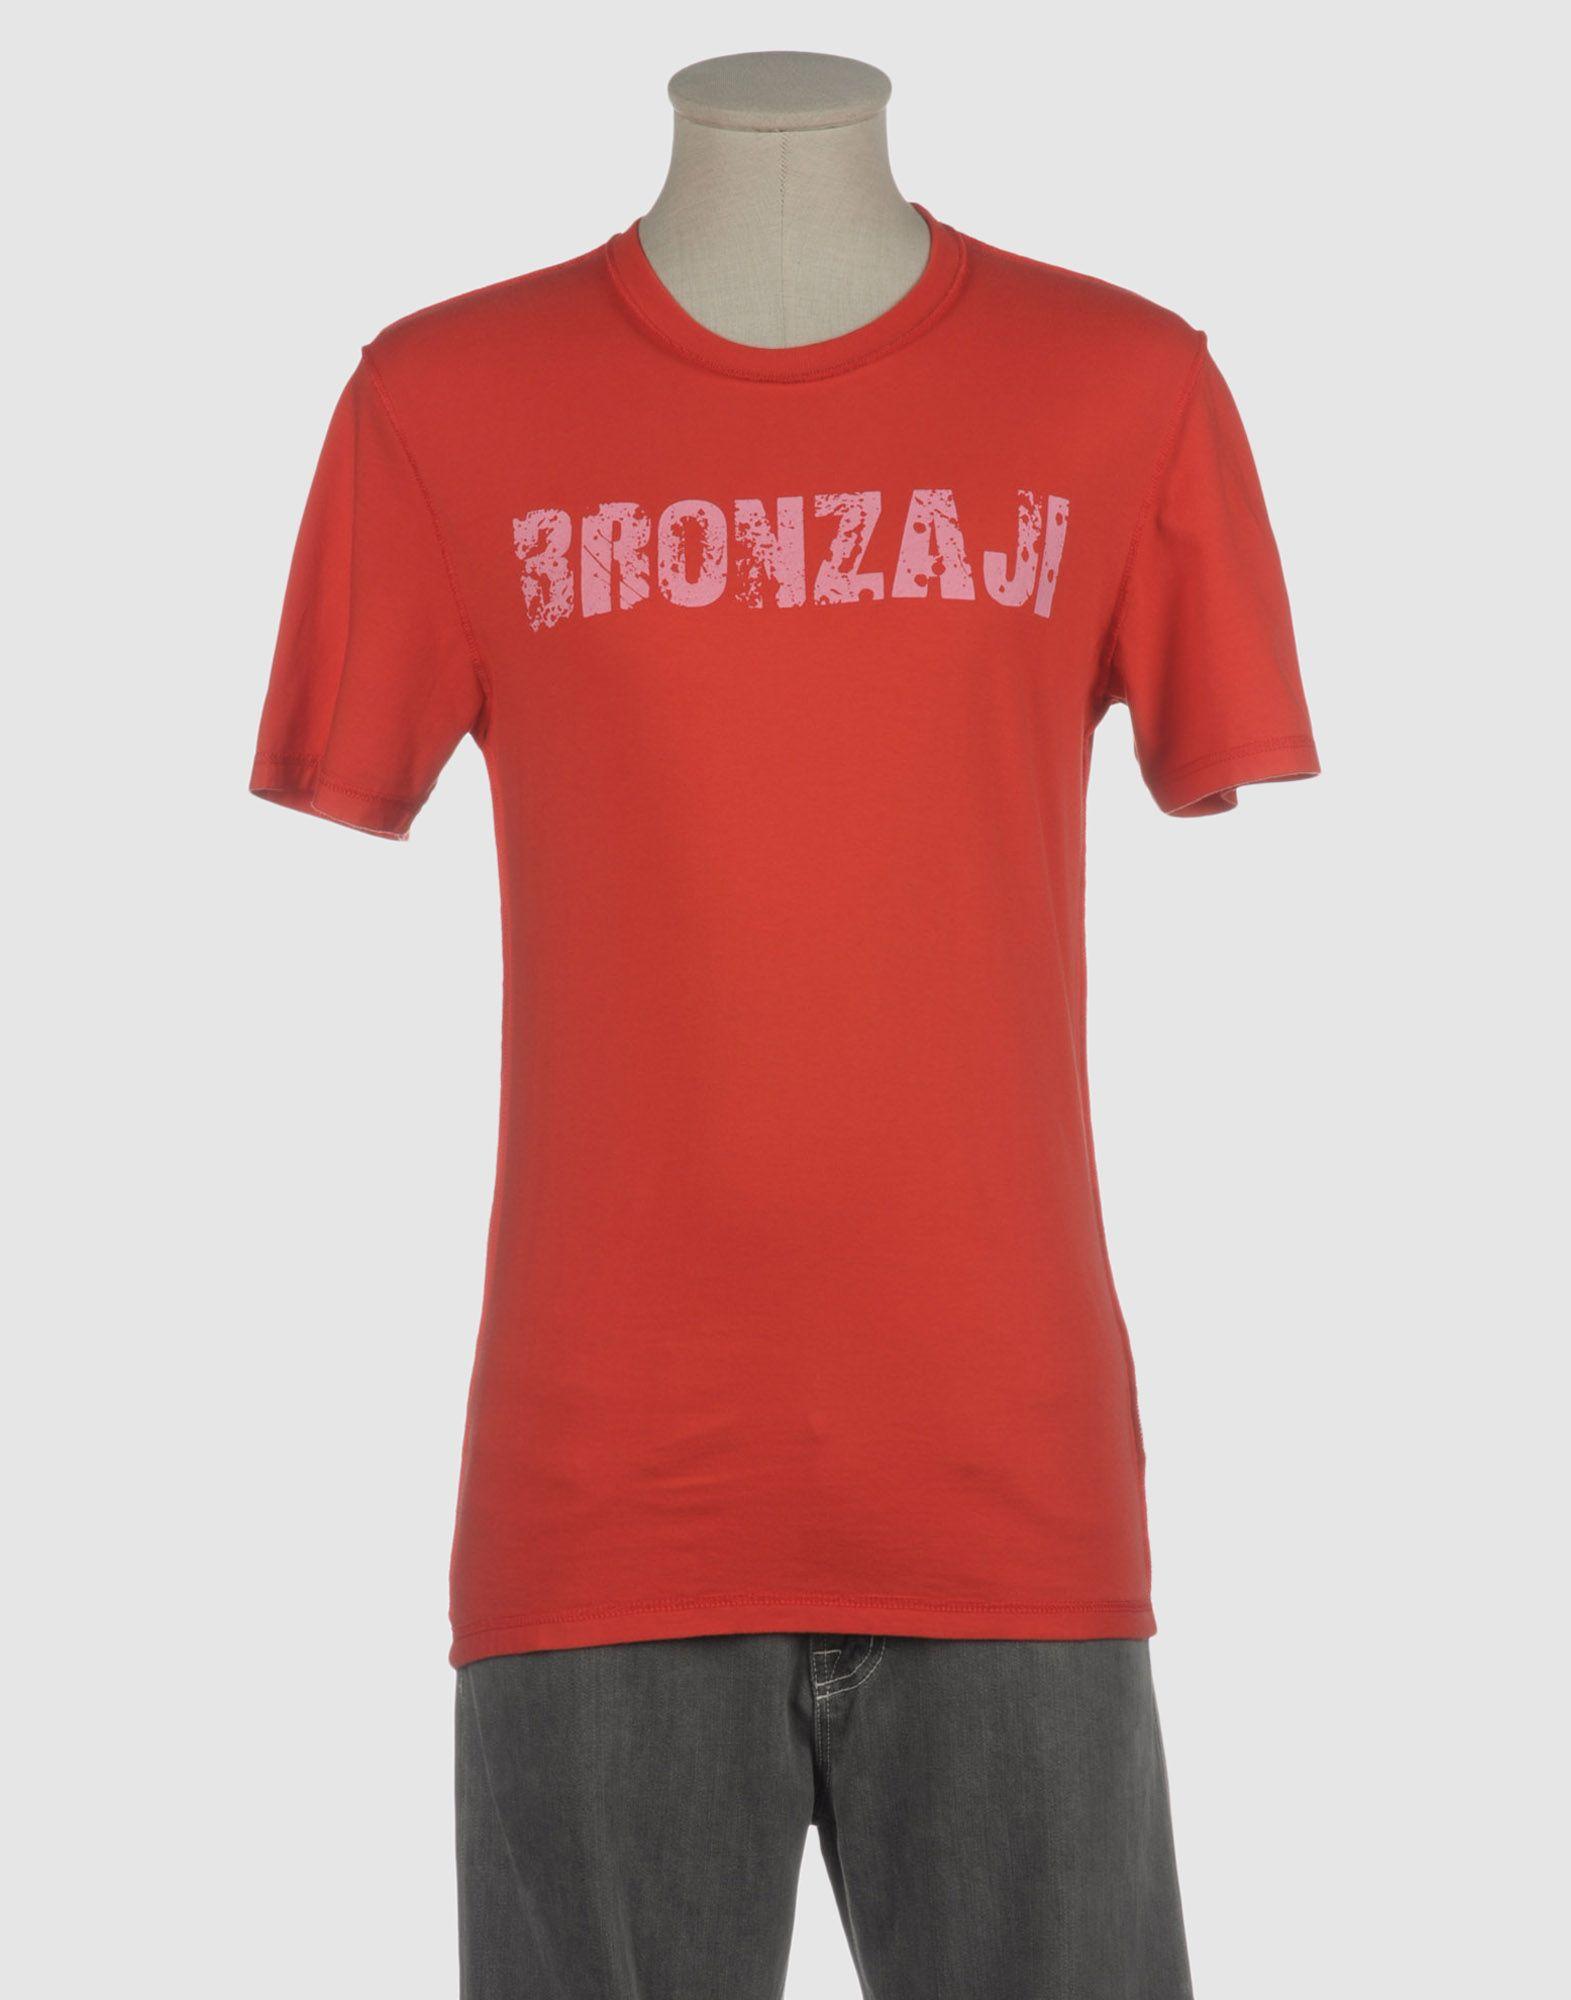 купить BRONZAJI Футболка с короткими рукавами по цене 1050 рублей